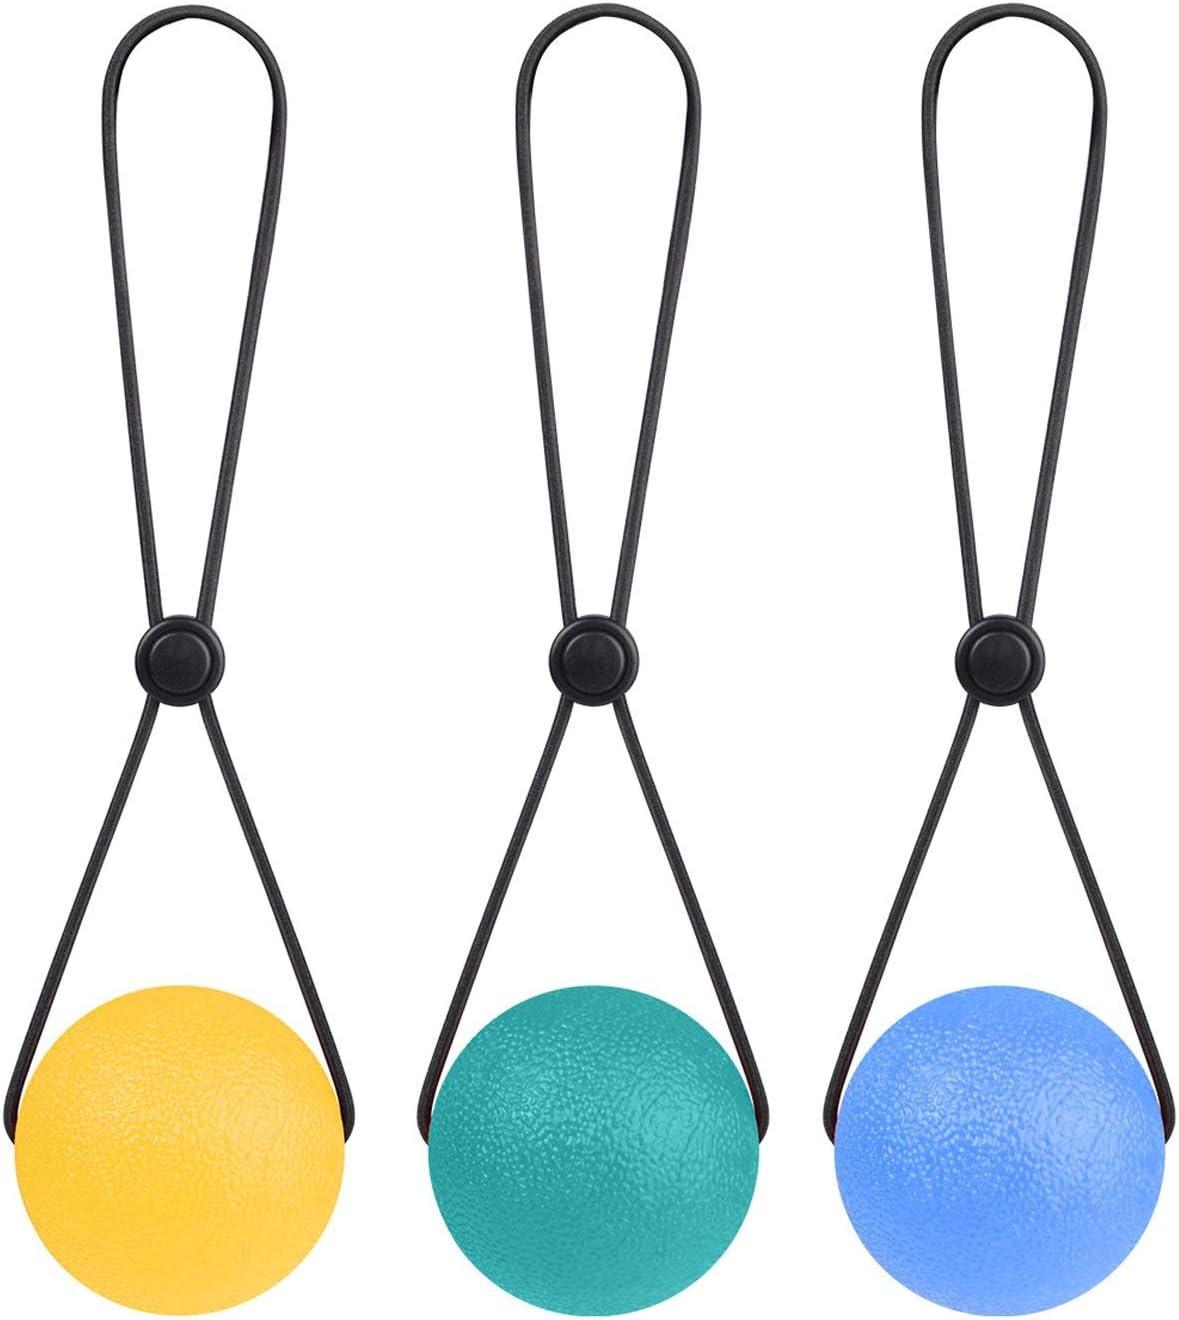 Geniteen Stress Ranking TOP6 Ball Set of Squeeze Nashville-Davidson Mall 3 Portable 2.1inch